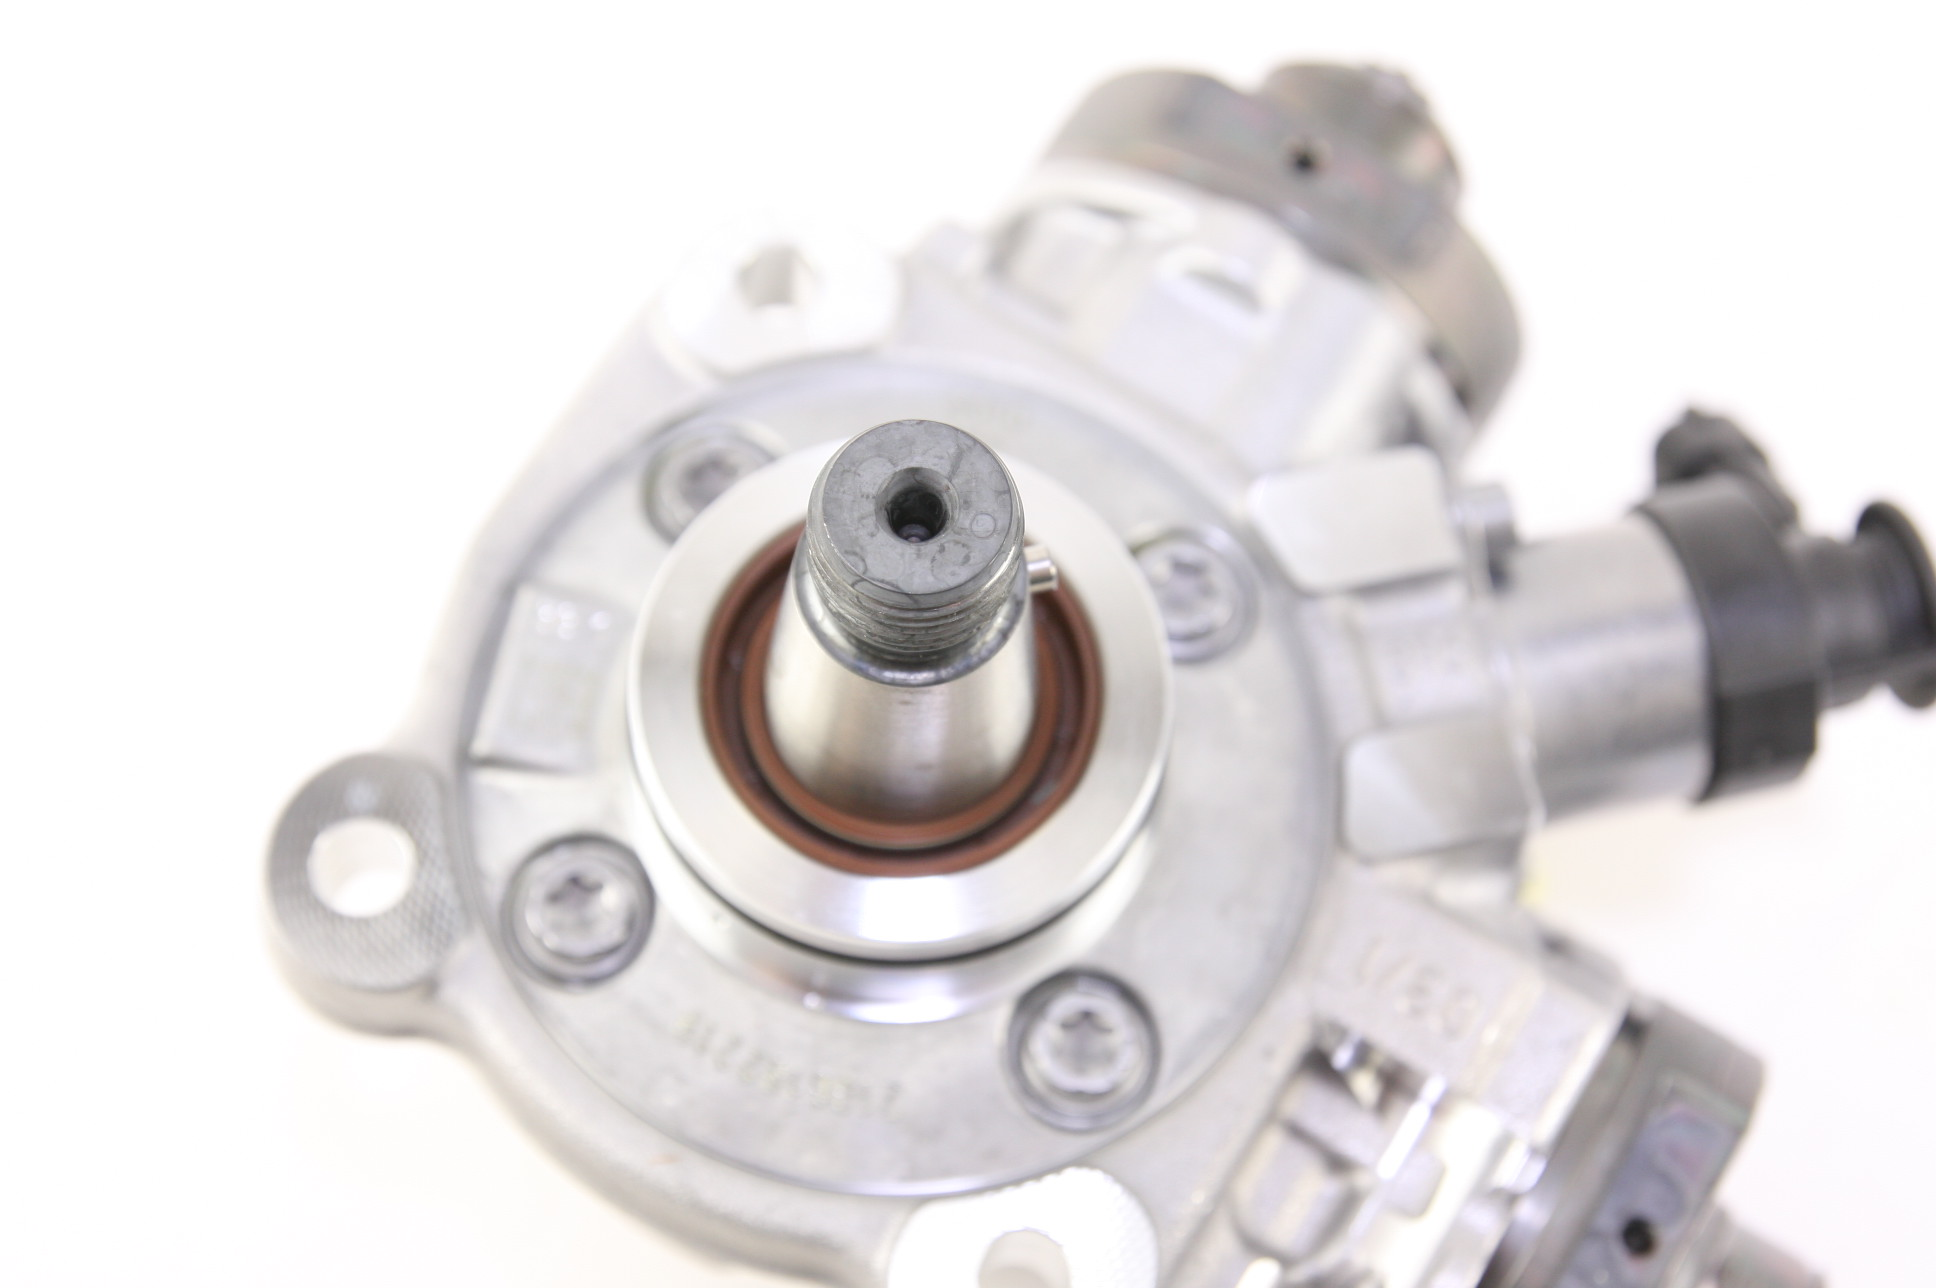 * New OEM BC3Z9A543A Ford 11-15 6.7L Powerstroke High Pressure Fuel Pump NIP - image 9